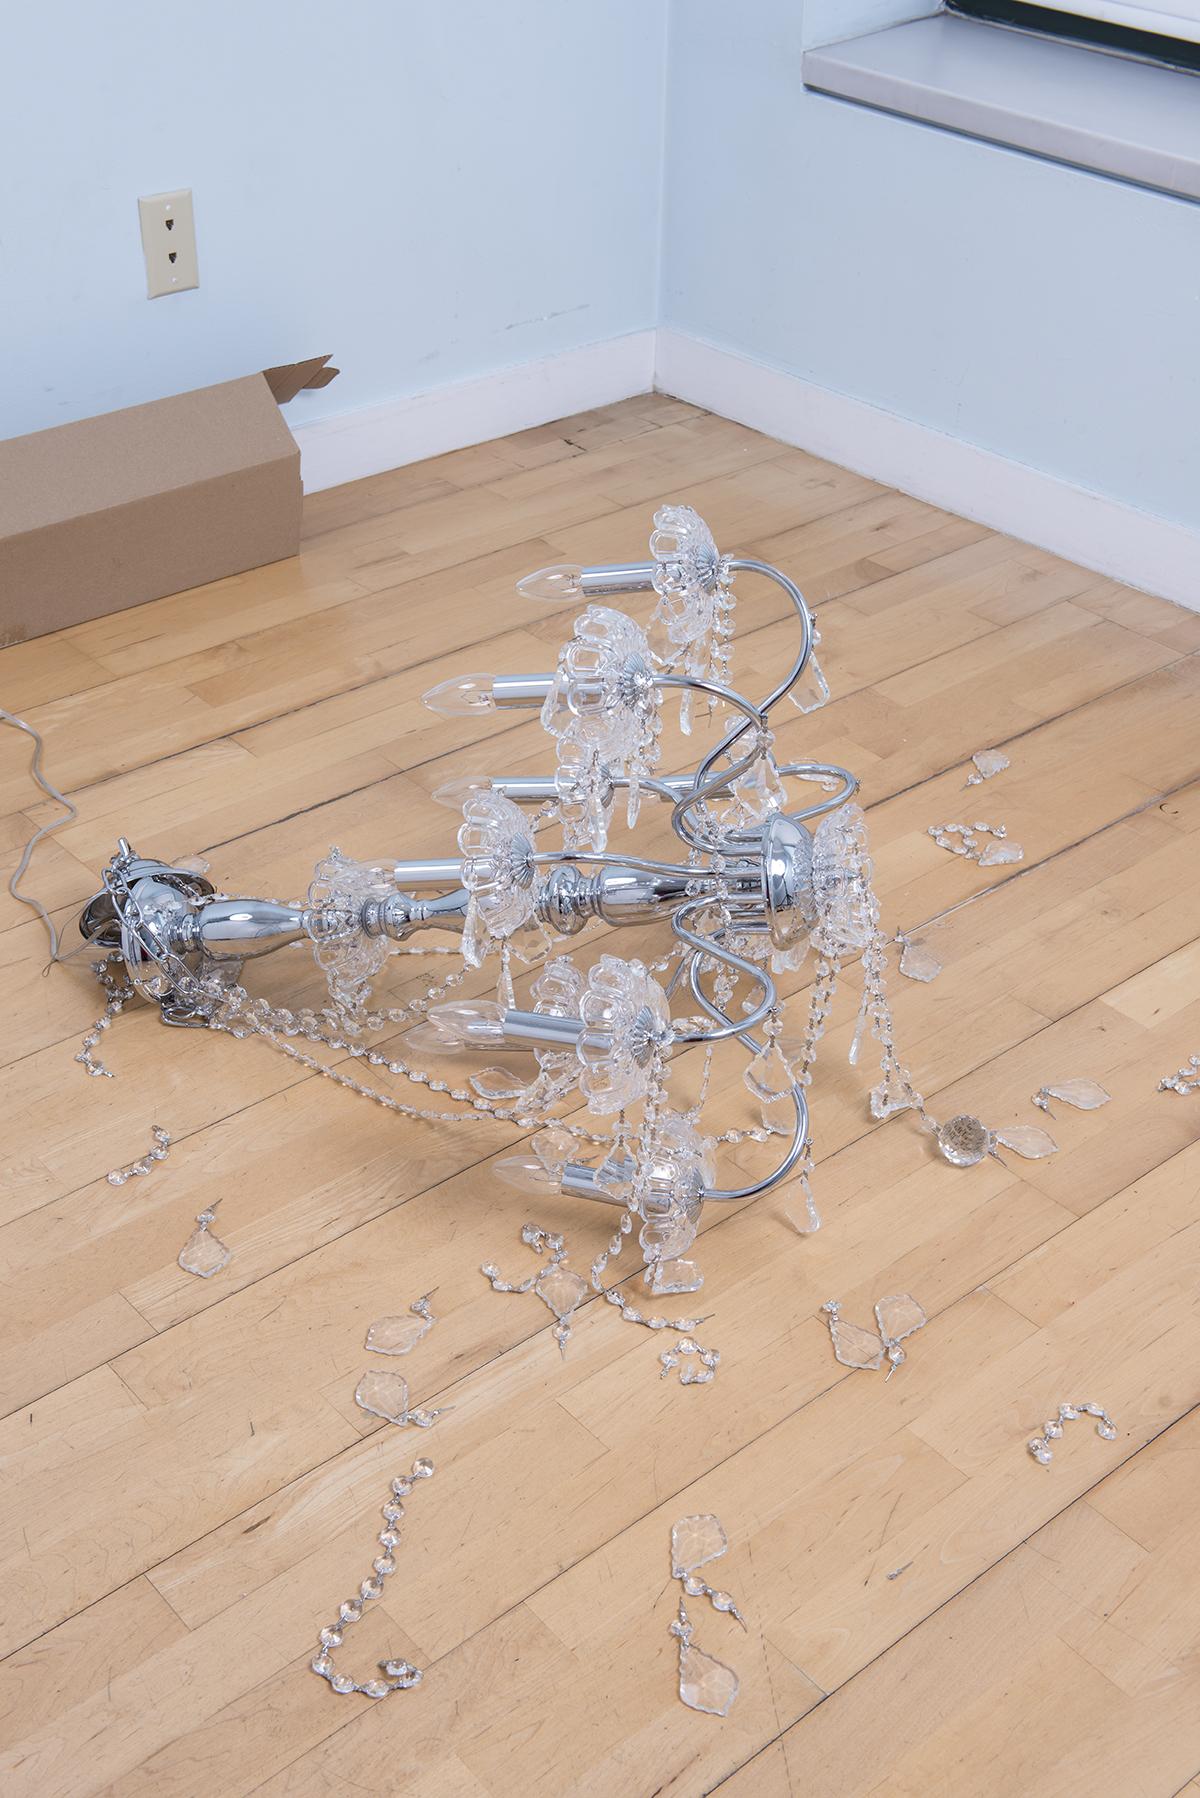 The Fallen Chandelier. Ilya and Emilia Kabakov. 1997. Installation Dimensions variable